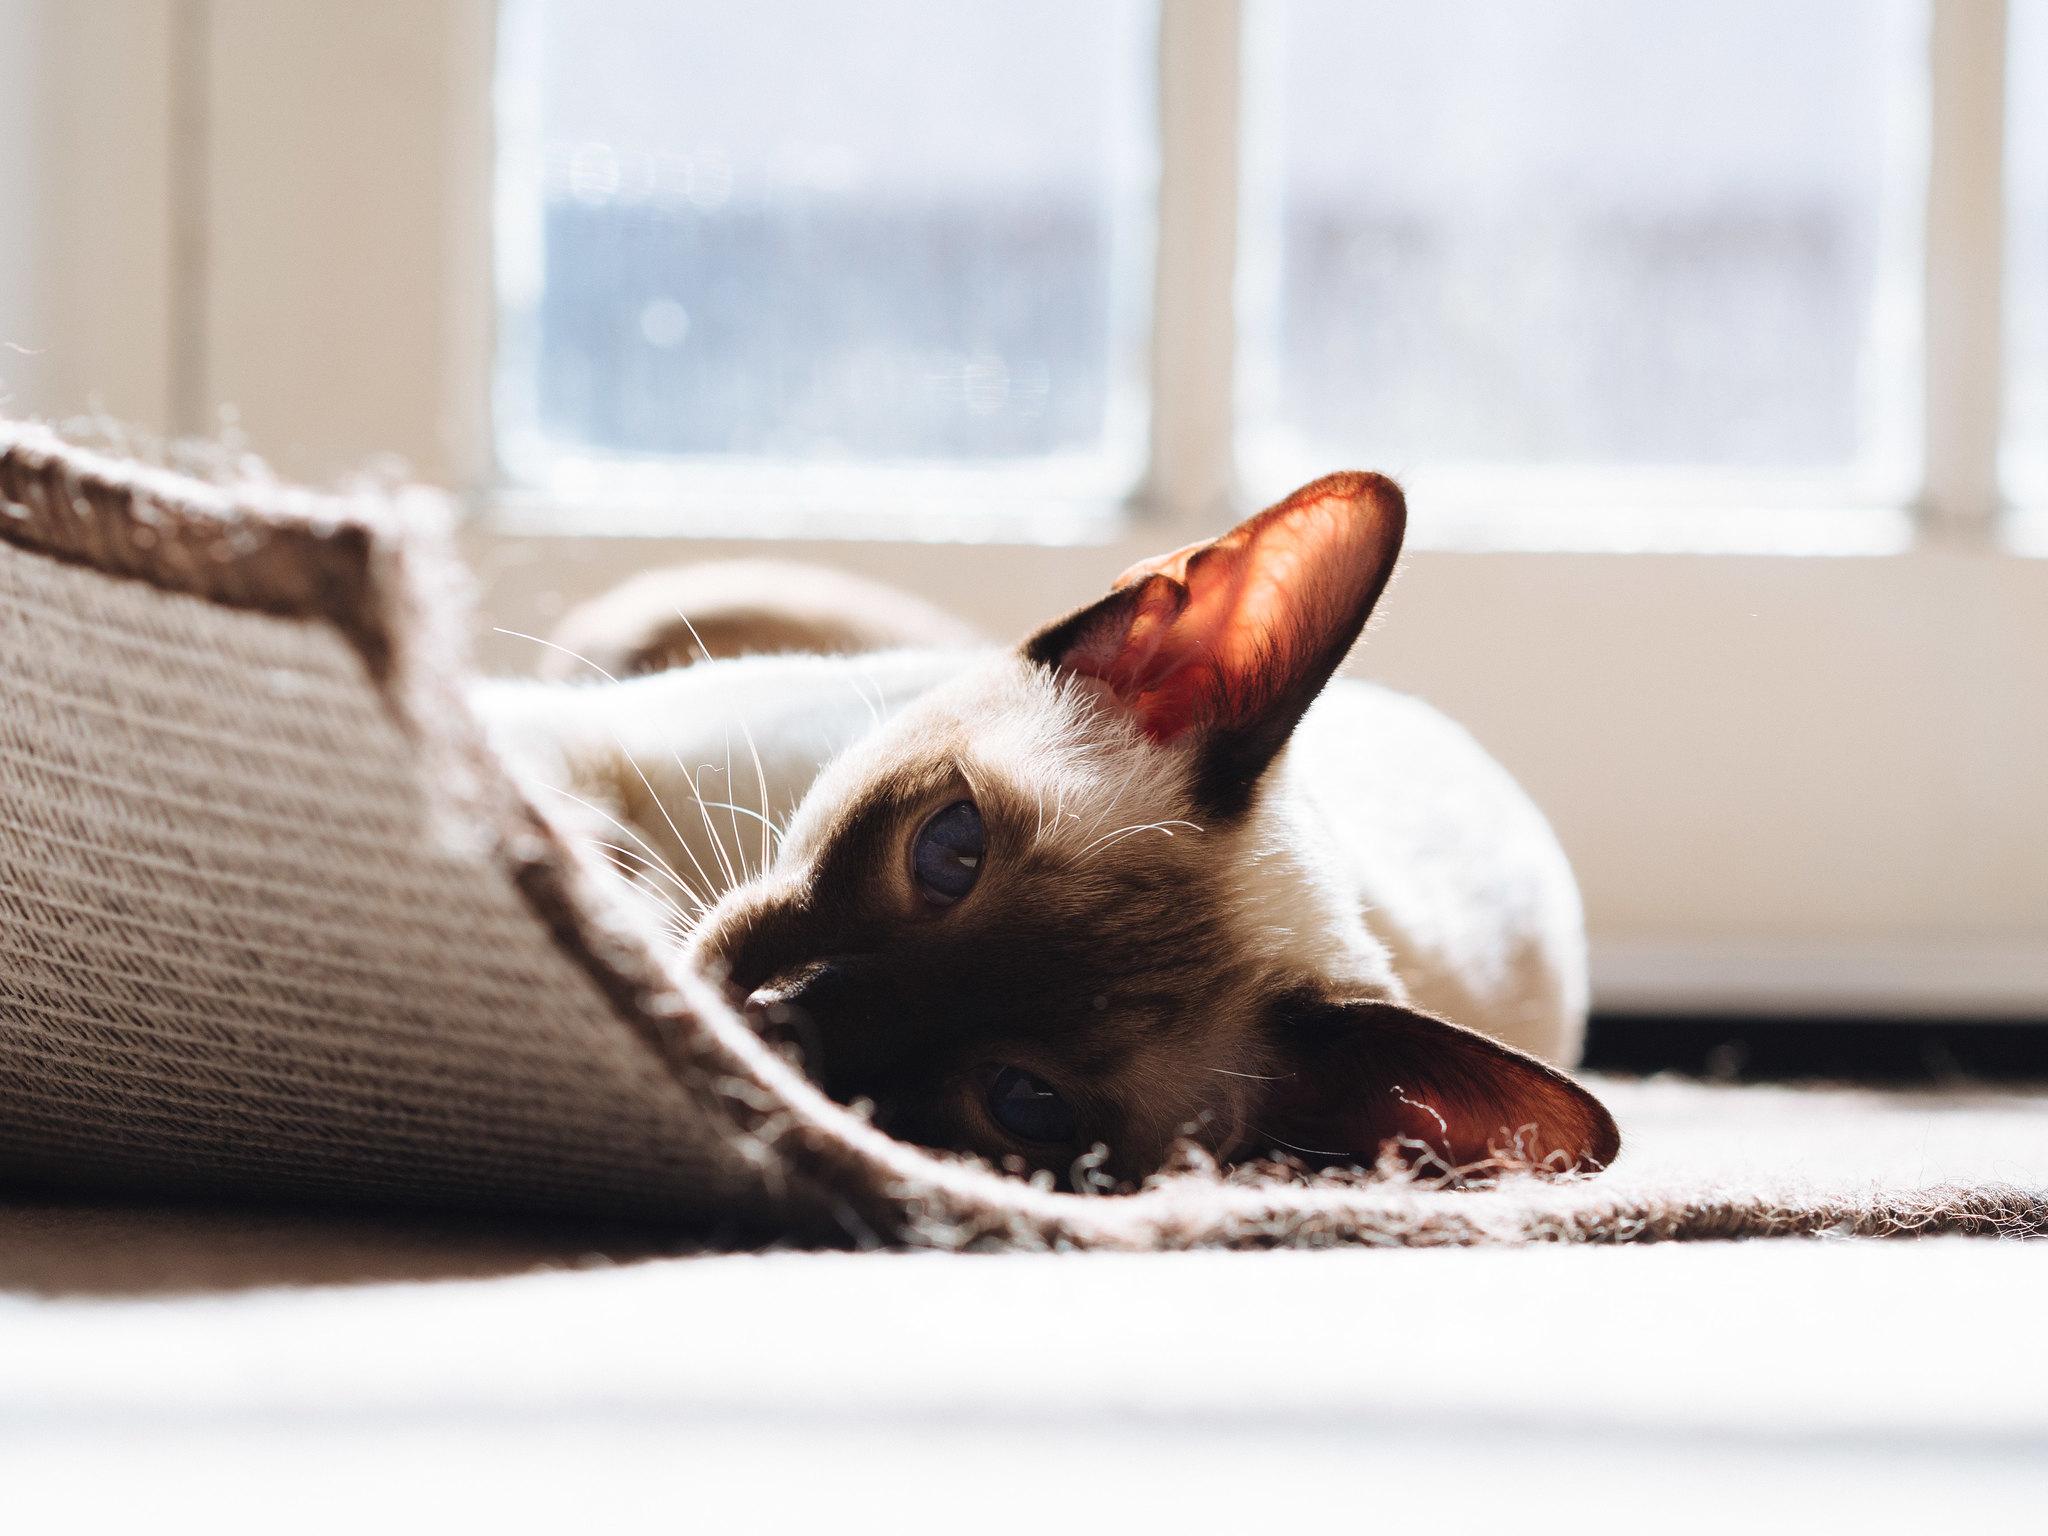 General 2048x1536 feline carpet Siamese cats warming in sunlight sunlight cats animals